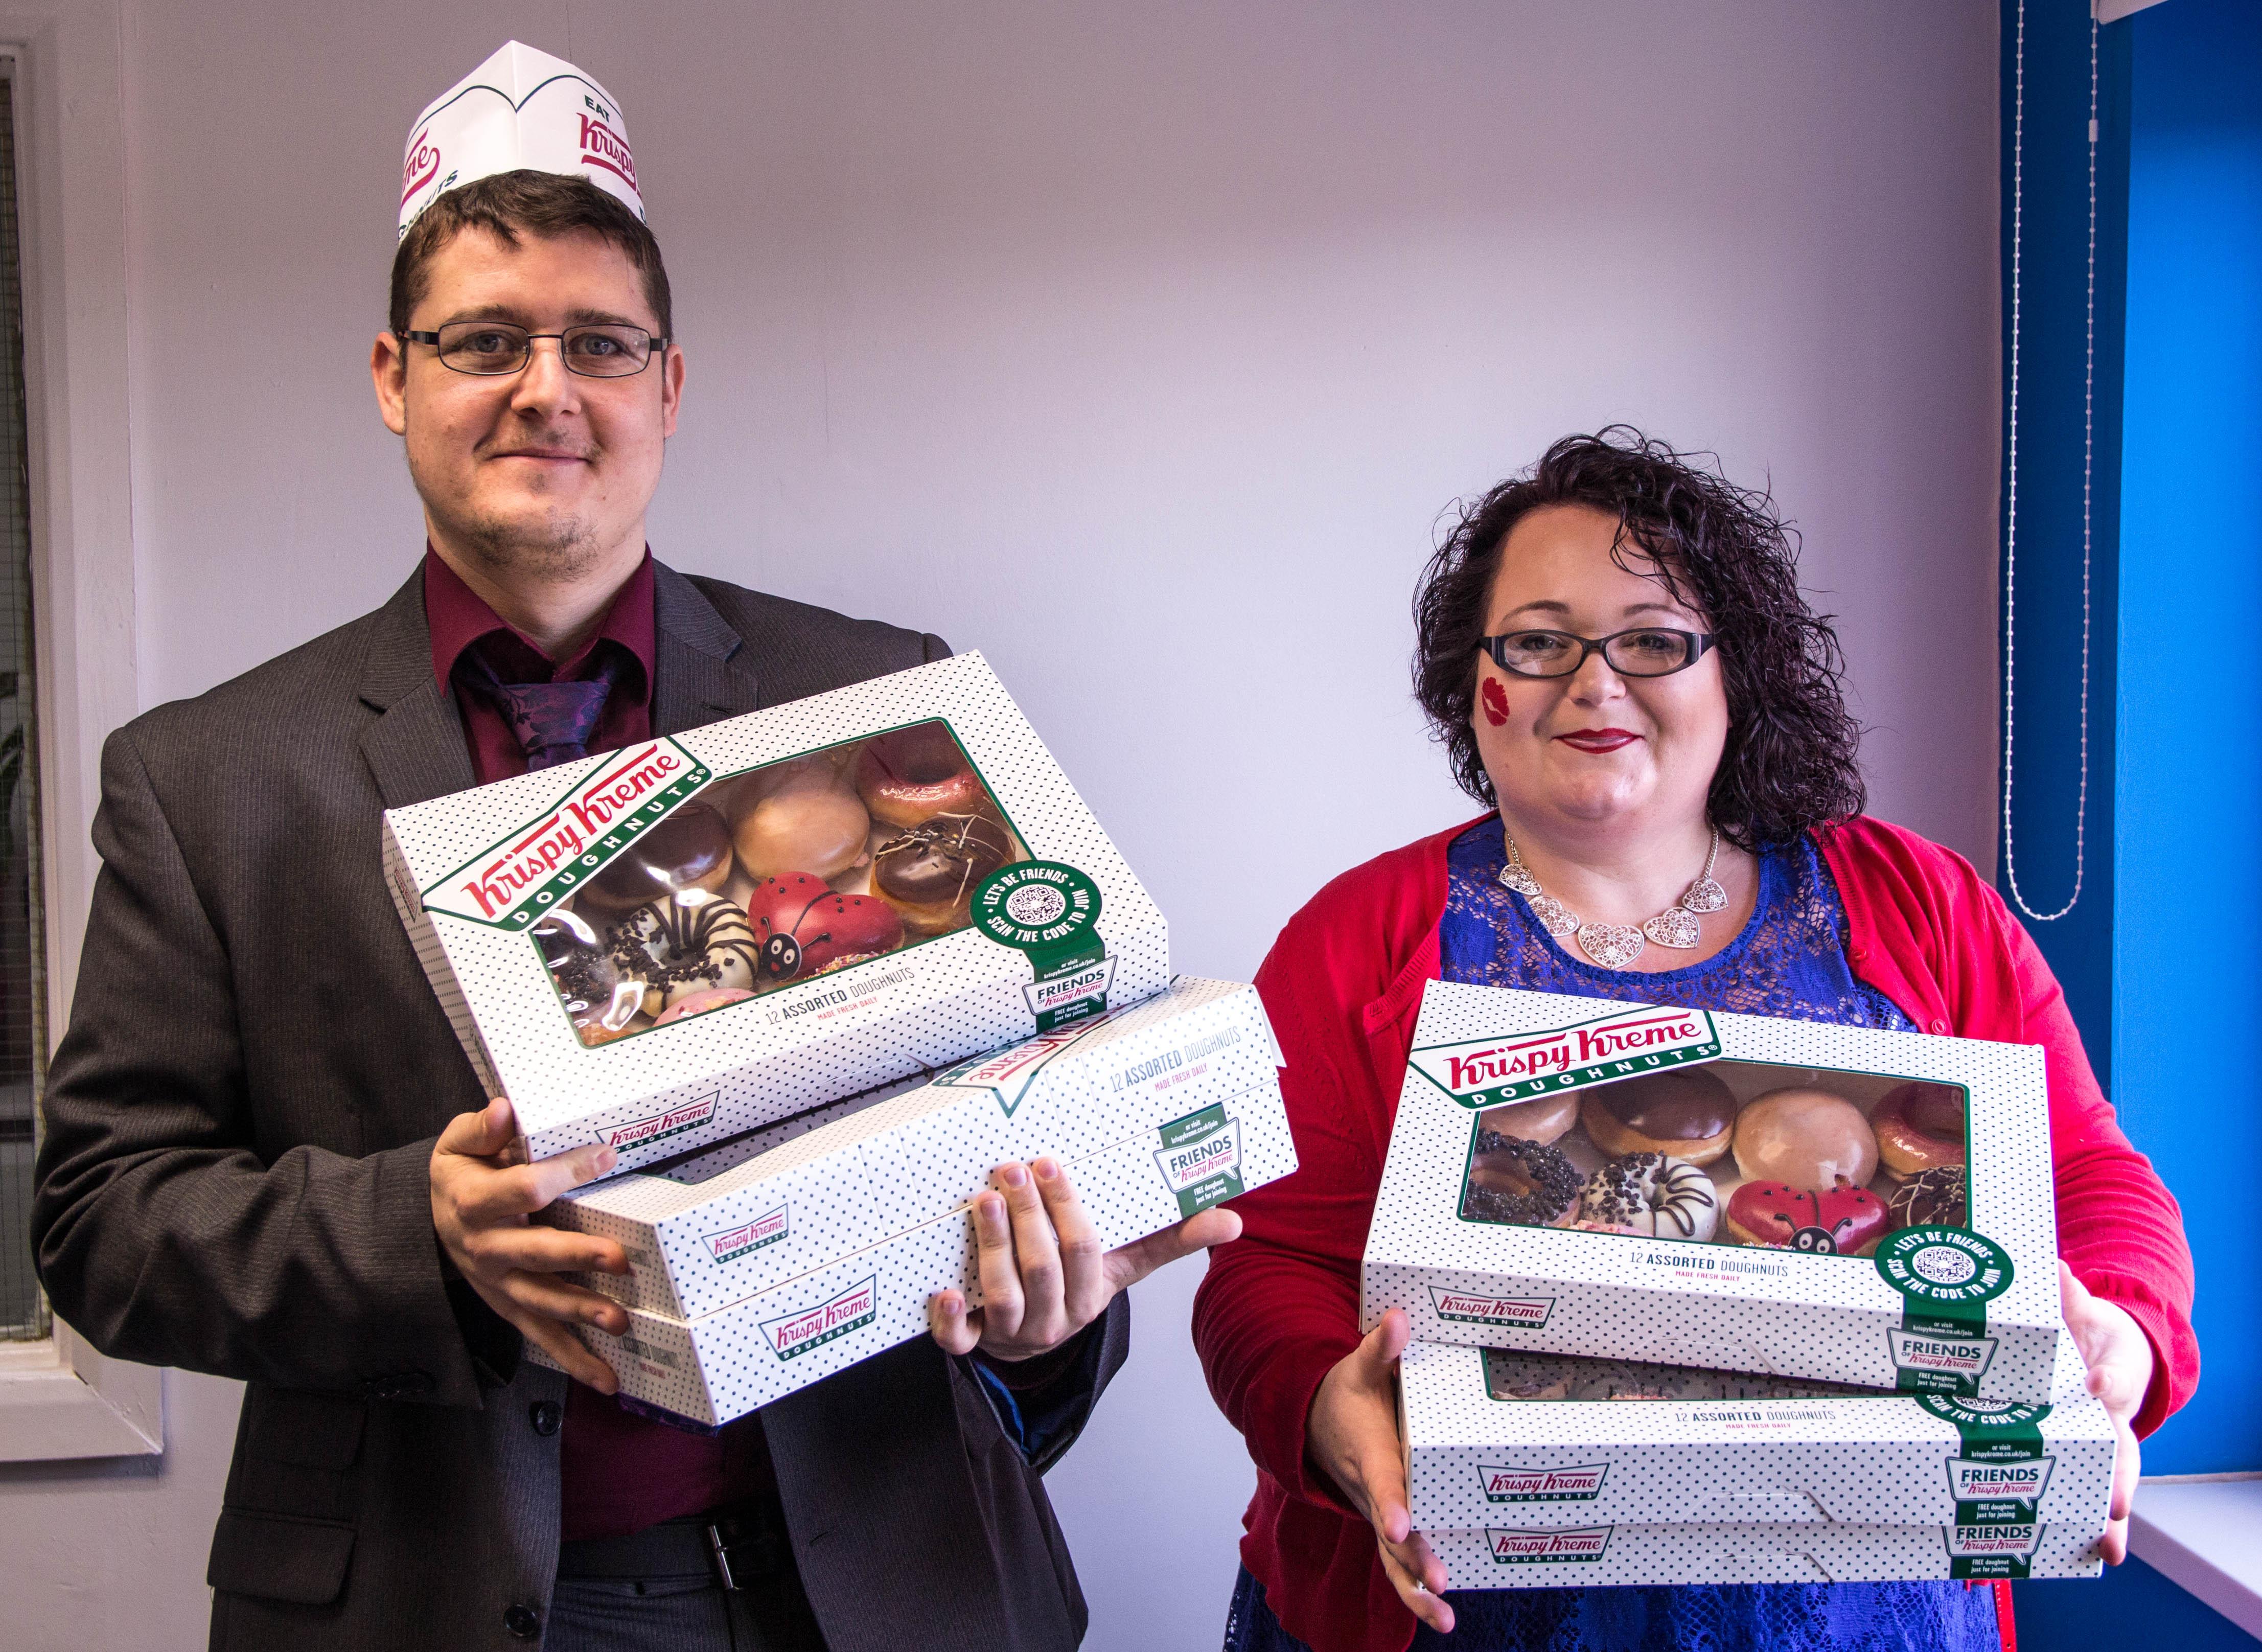 Doughnut Street Team - Chris Hall & Lisa Anderson